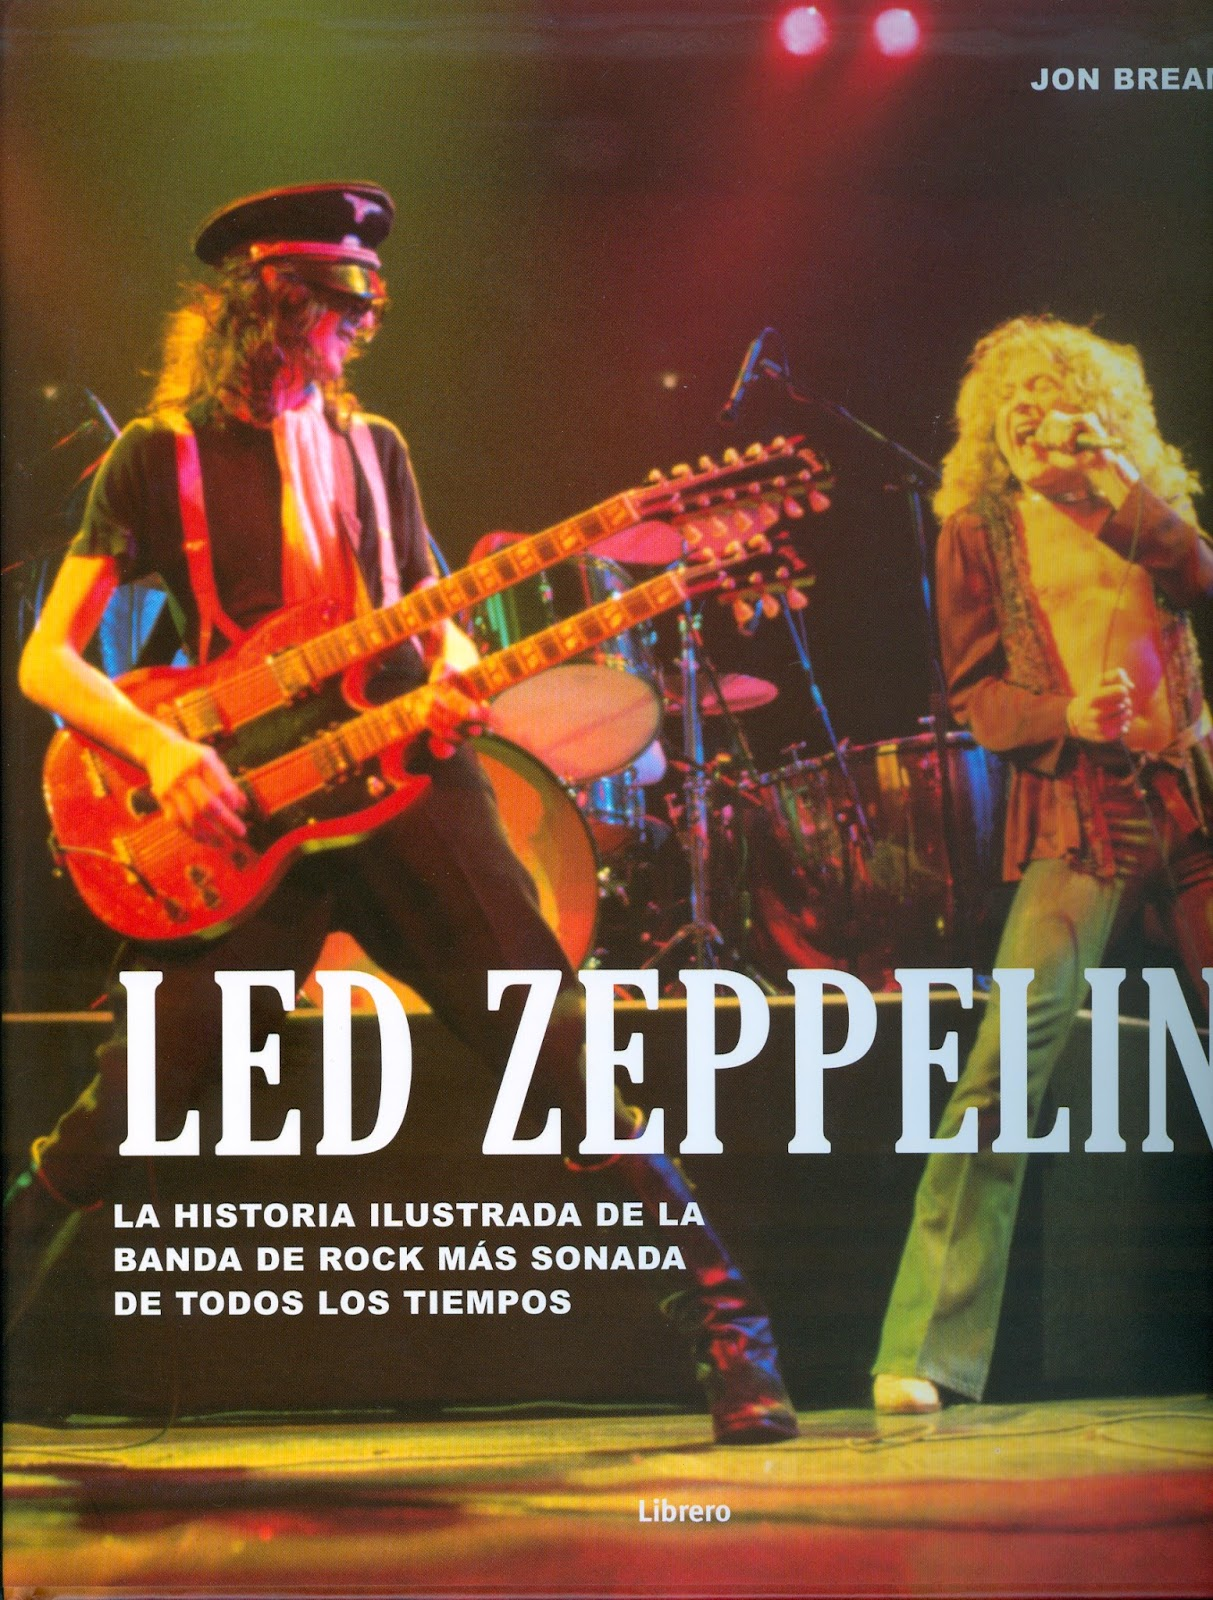 LED ZEPPELIN  LA HISTORIA ILUSTRADA Librero